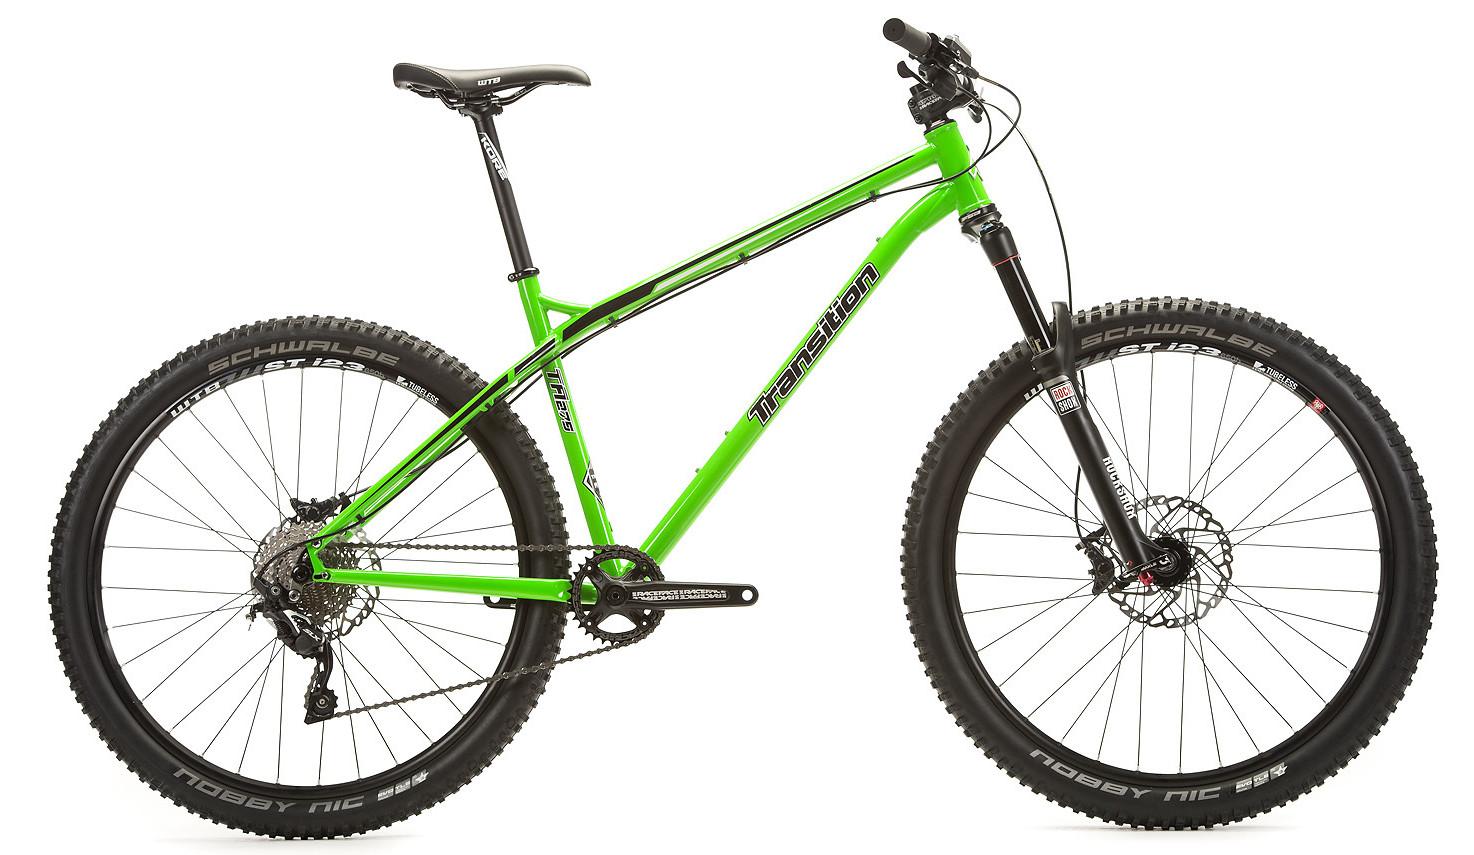 Transition TransAM Bike